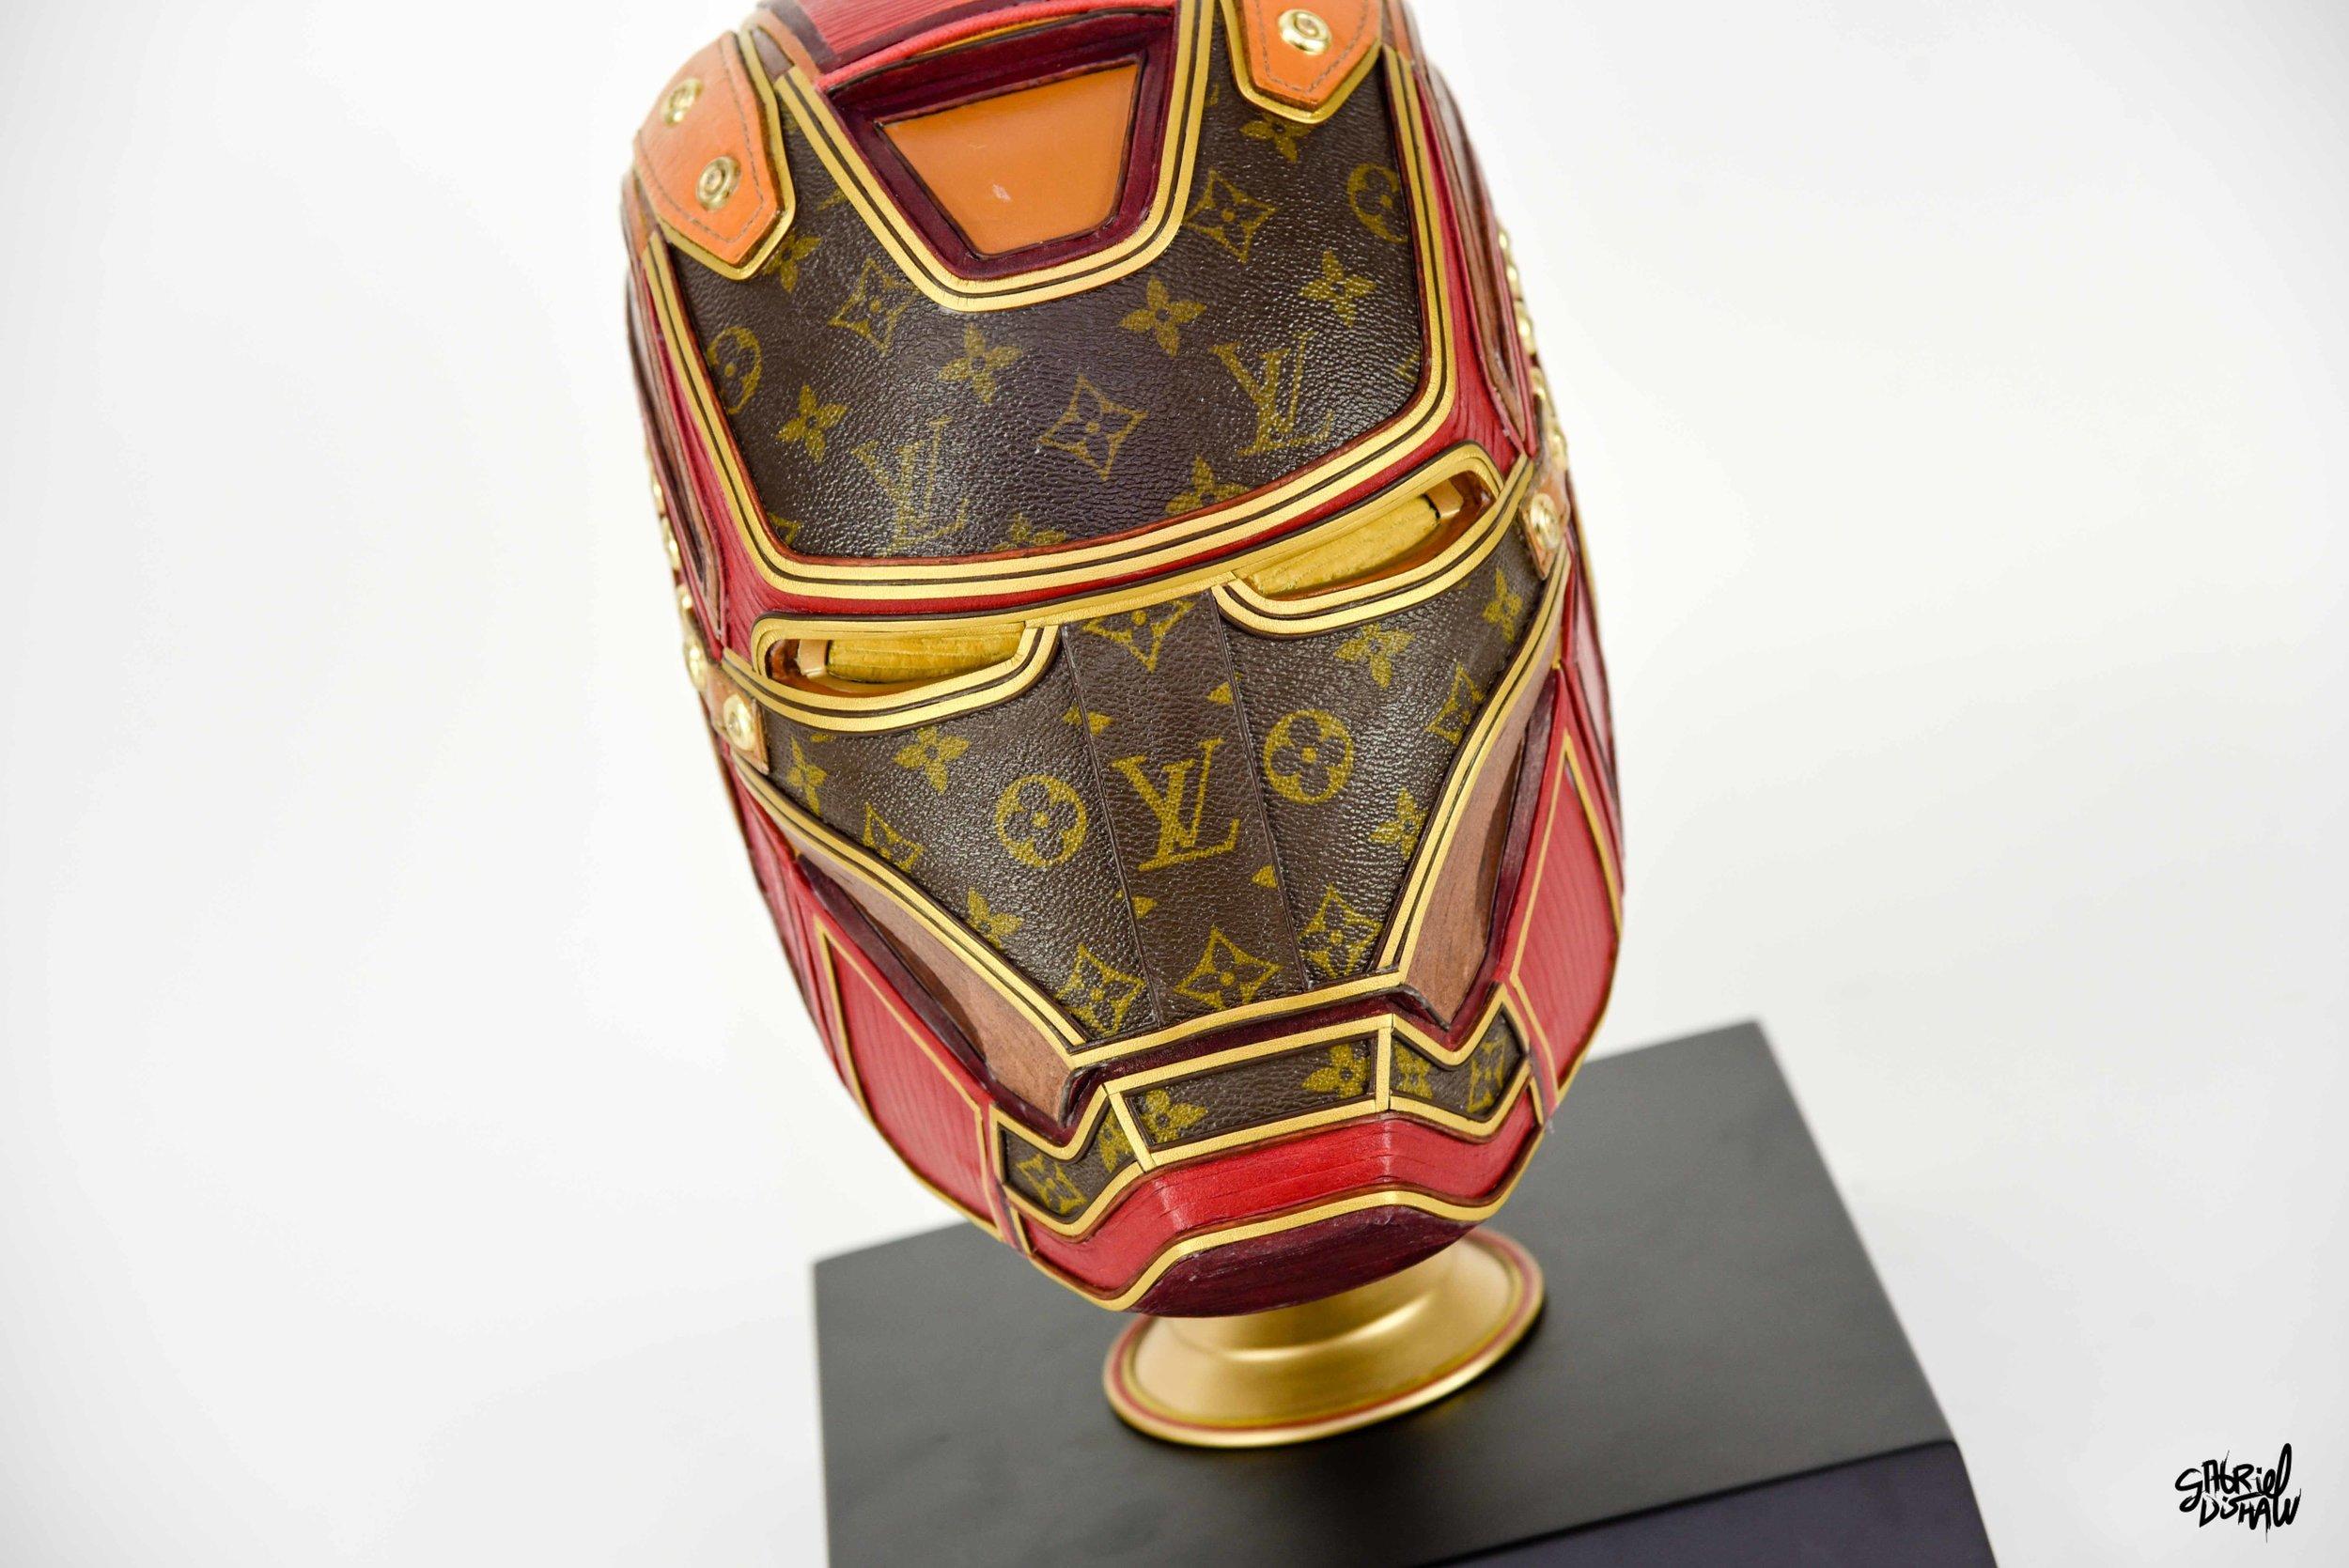 Gabriel Dishaw Iron Man LV Two-4323.jpg